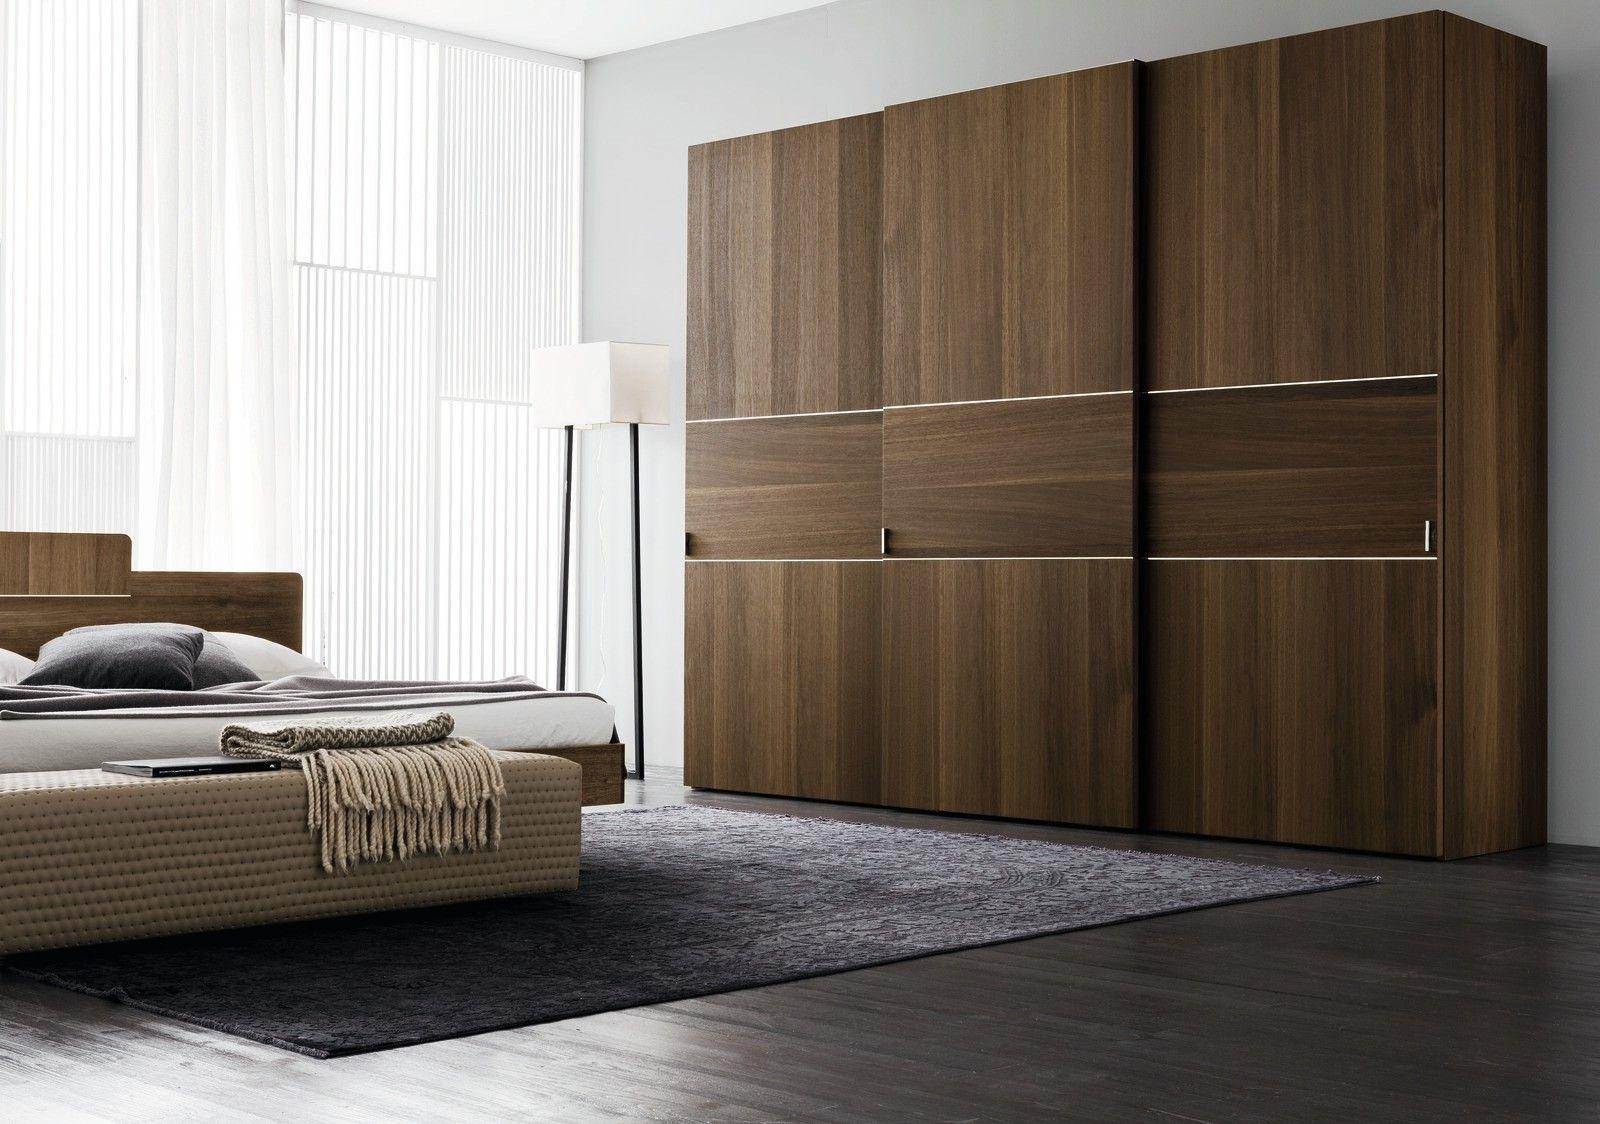 Icymi Sliding Wardrobe Designs For Bedroom Sliding Wardrobe Designs Wardrobe Design Bedroom Wardrobe Doors